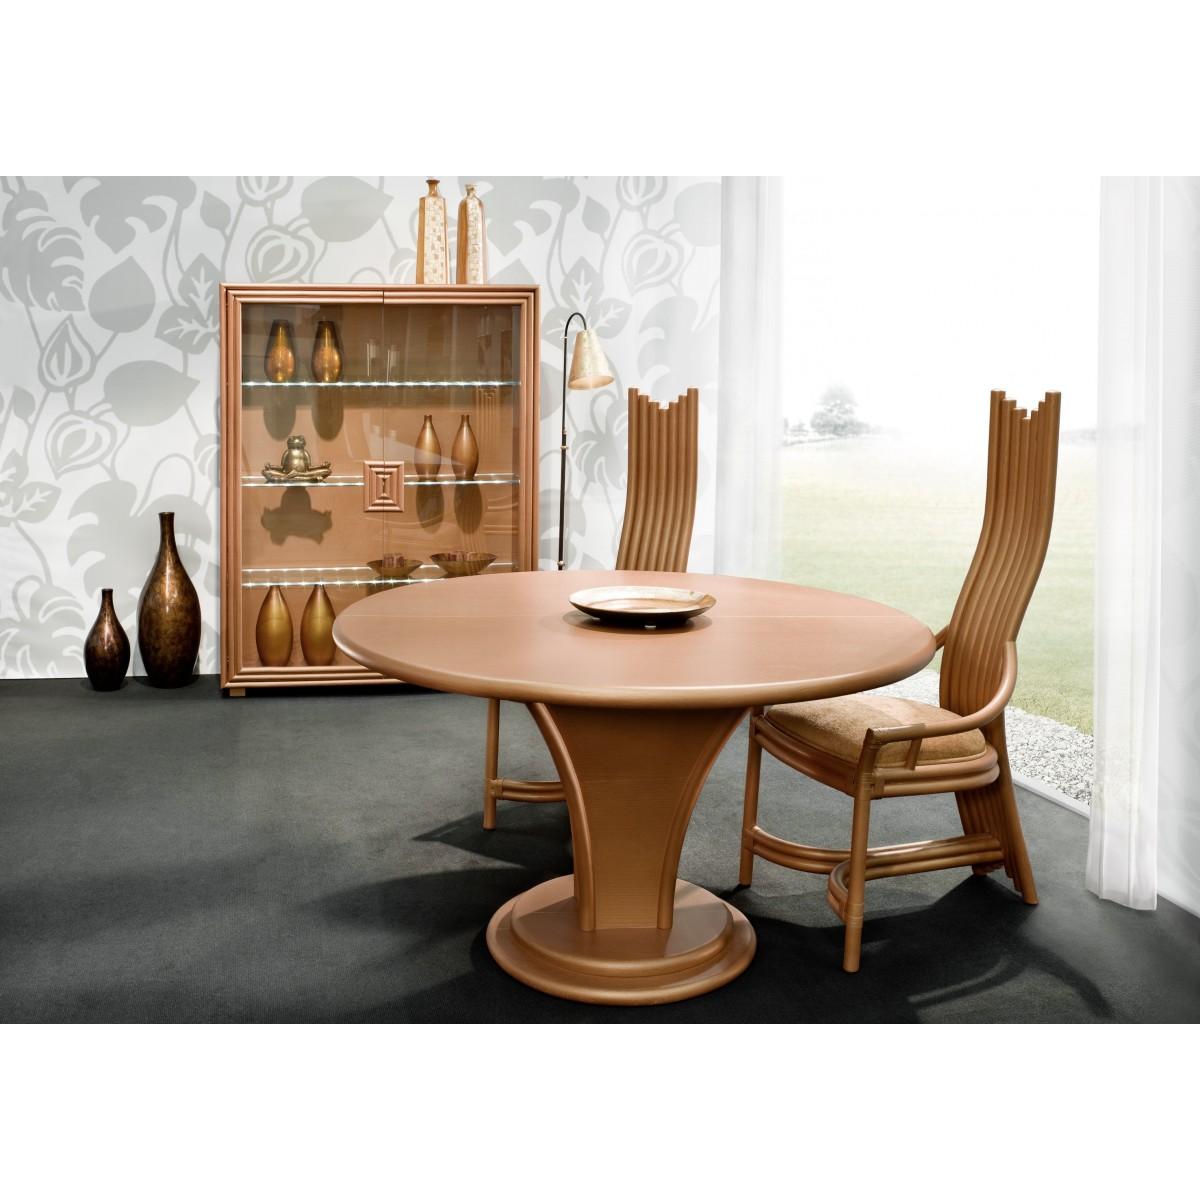 Table manger en rotin cronde avec allonge int gr e for Table ronde en rotin